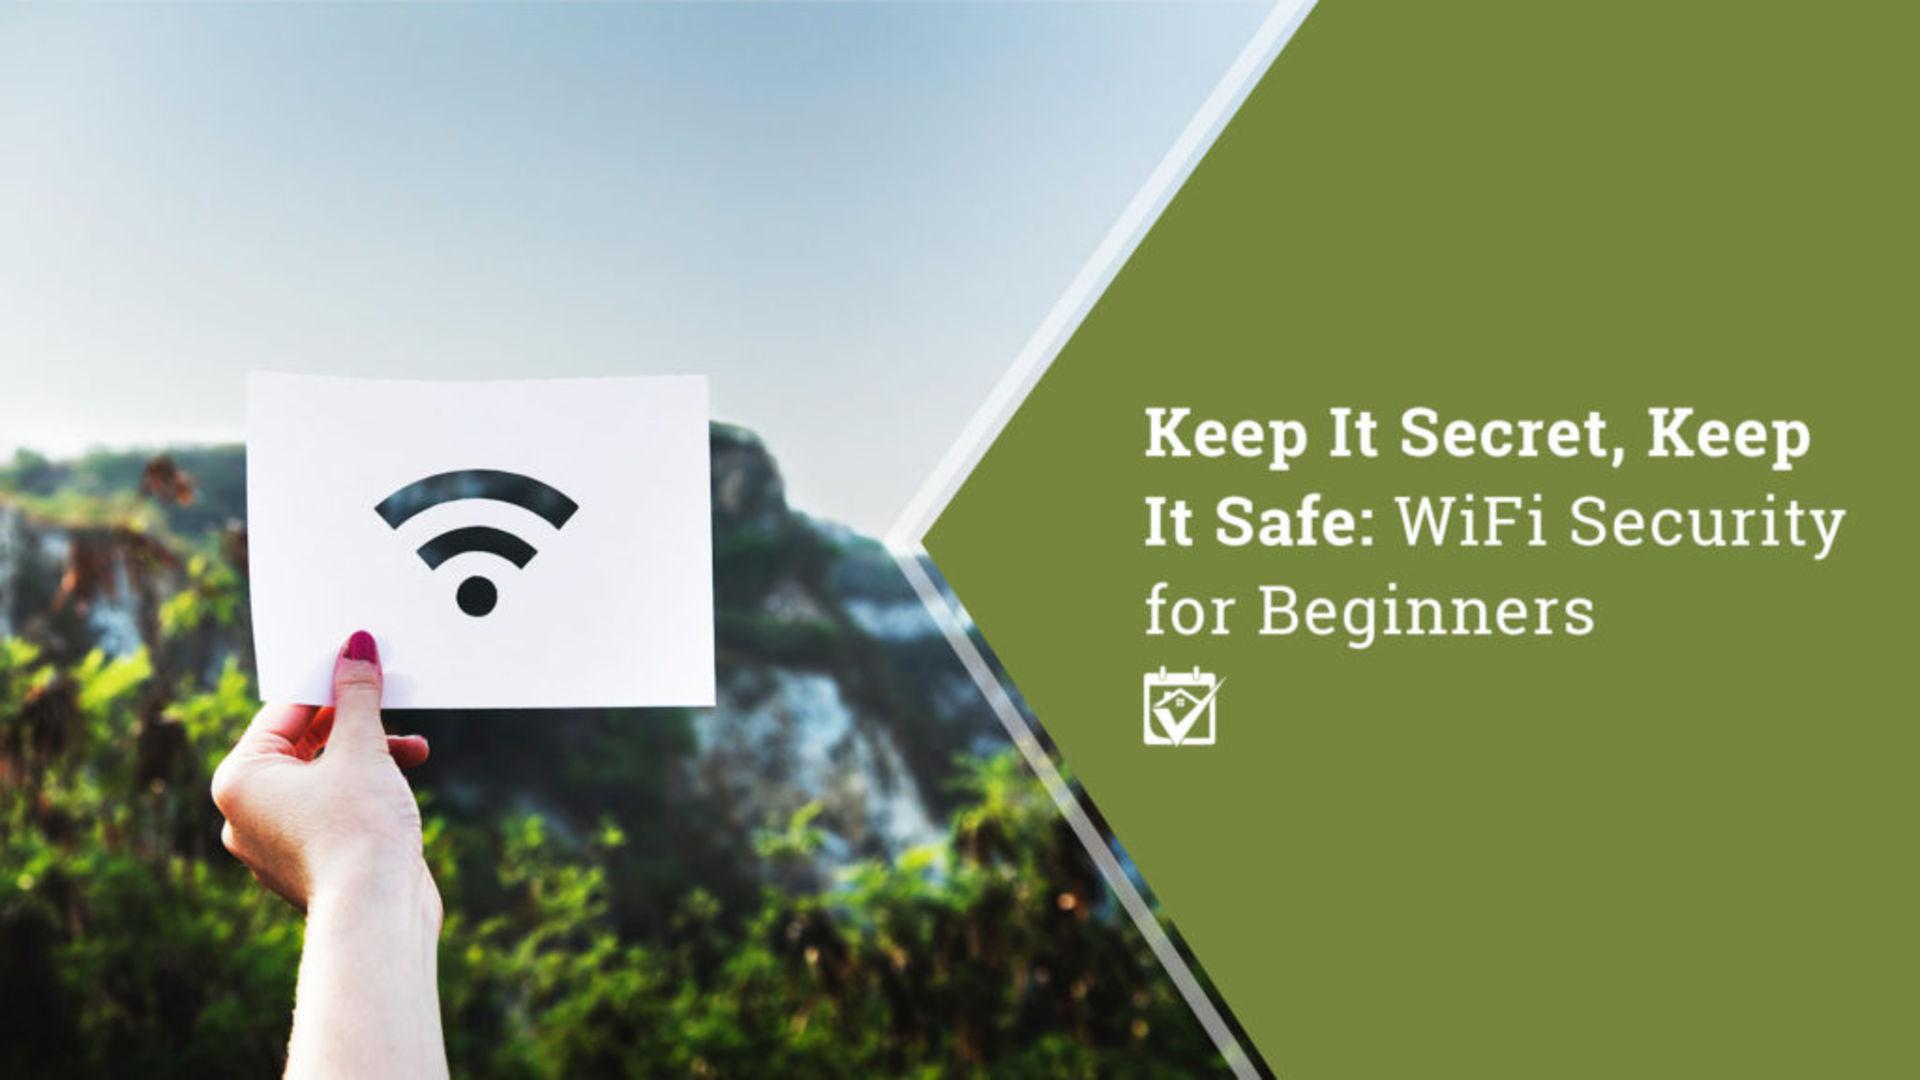 Keep It Secret, Keep It Safe: WiFi Security for Beginners